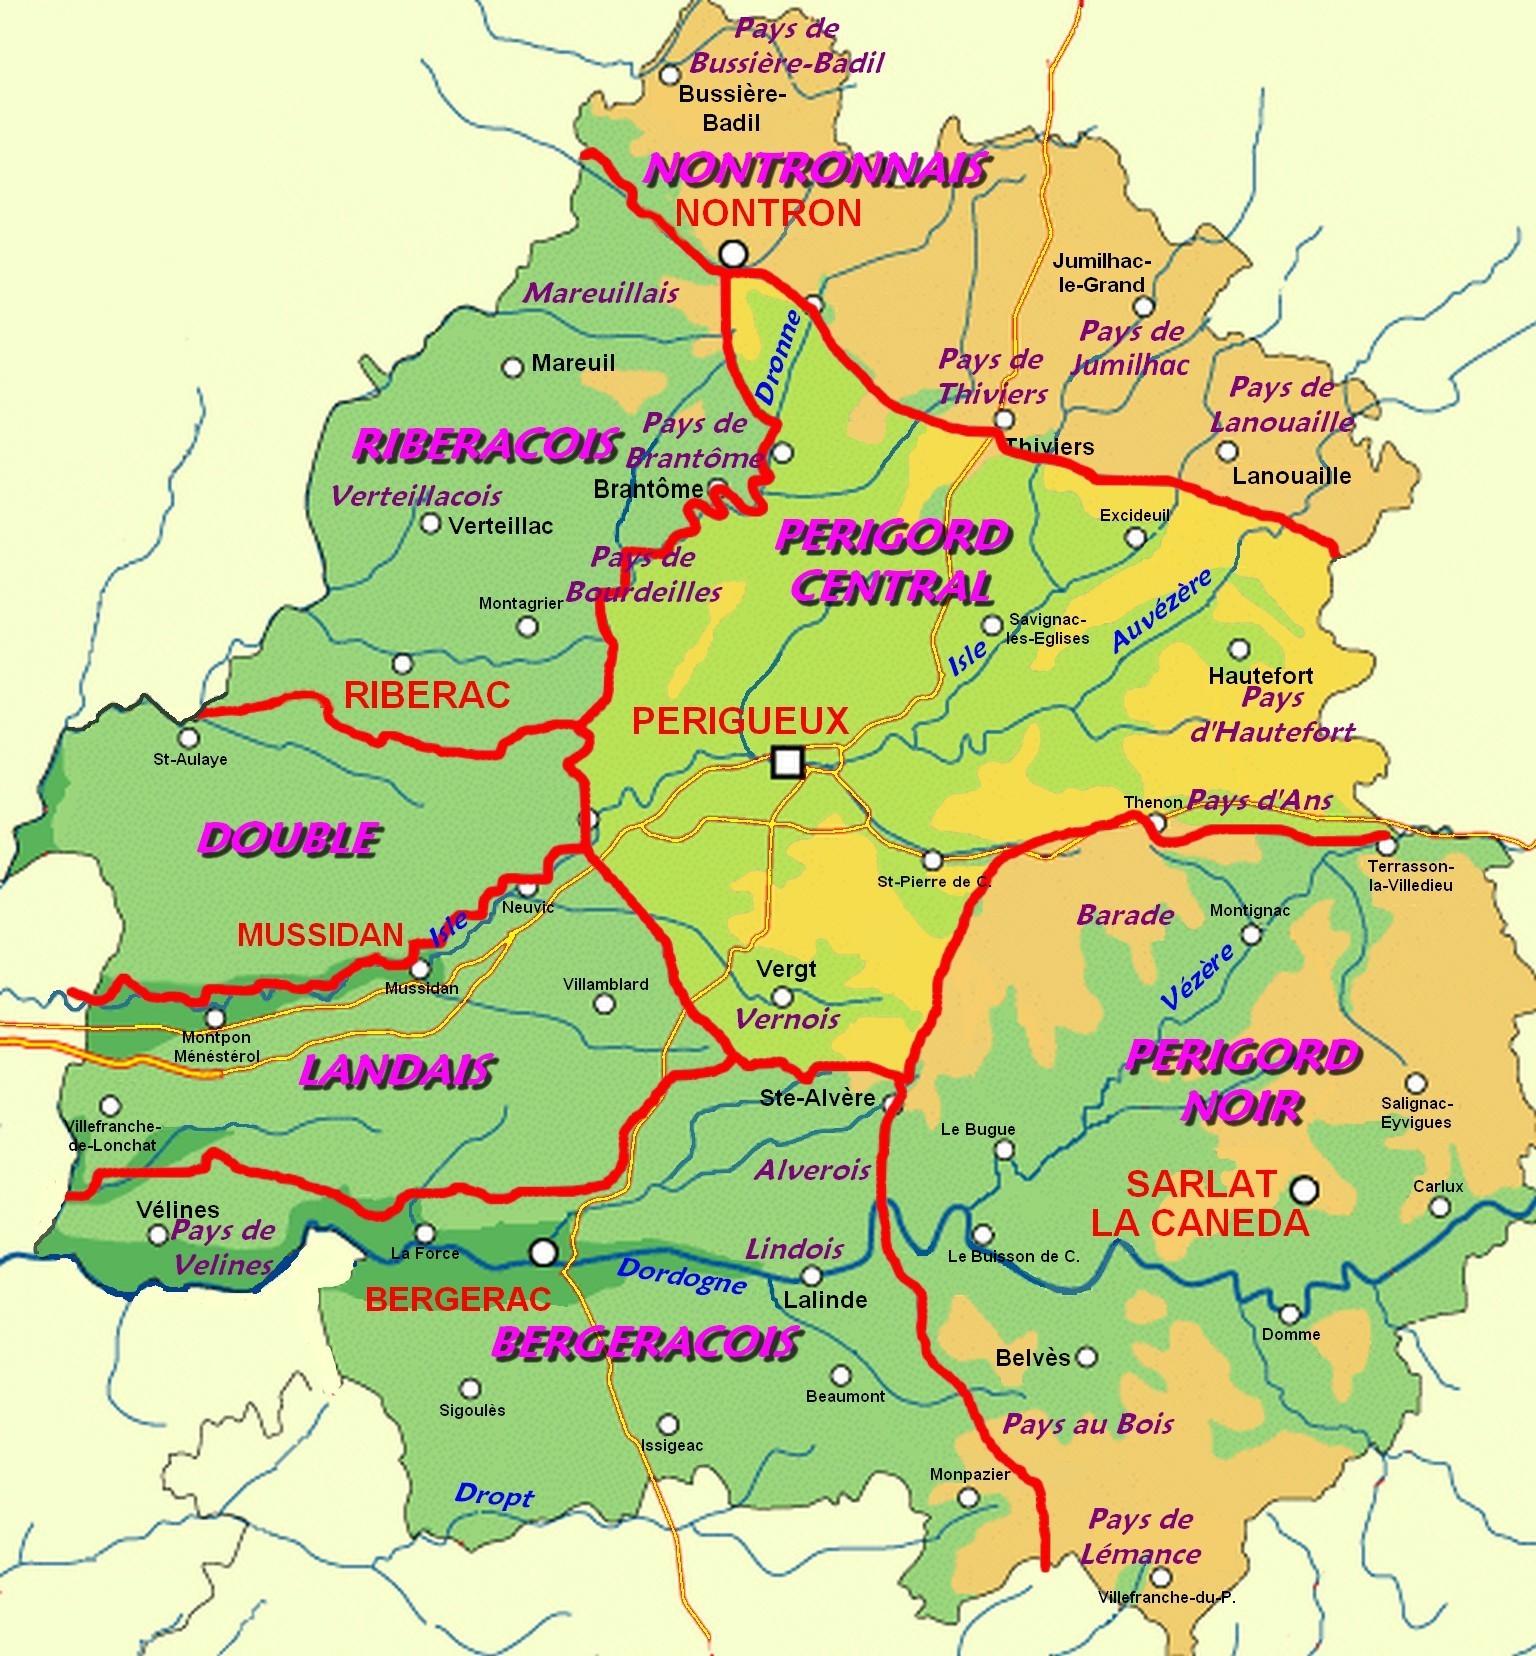 carte de la dordogne détaillée File:Perigord Central.   Wikimedia Commons